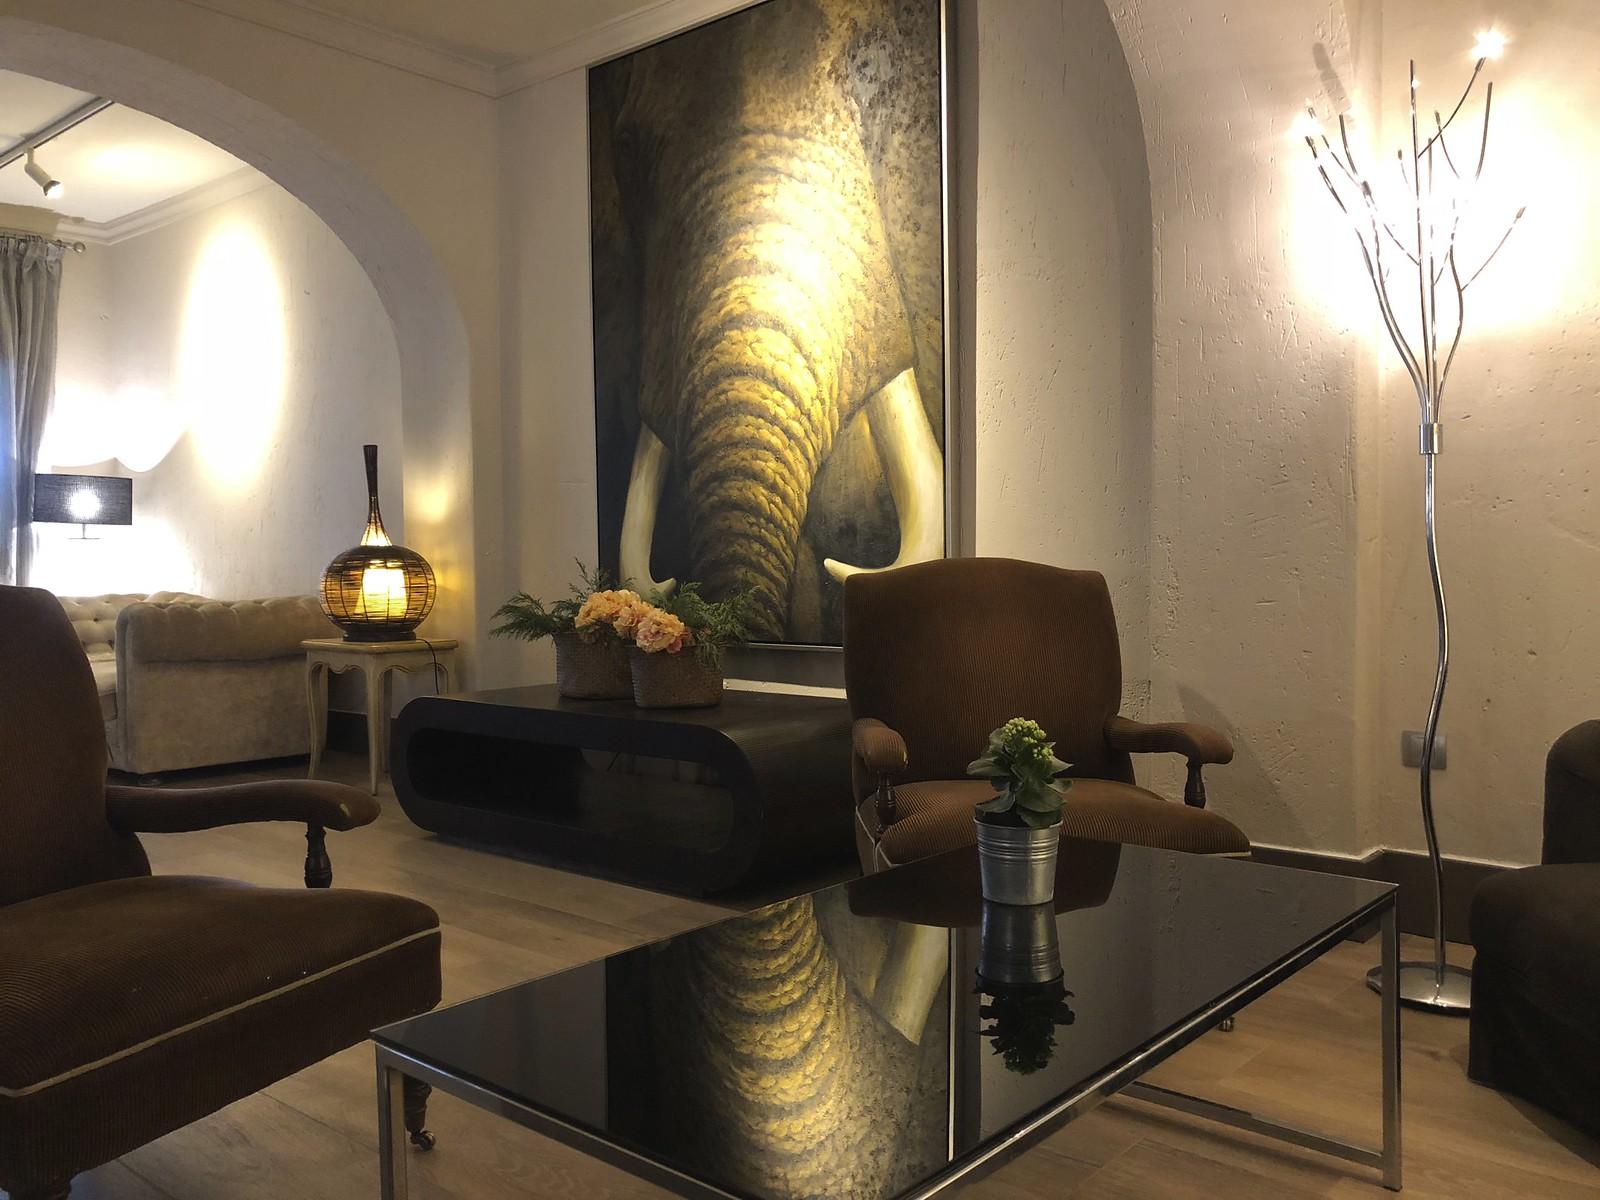 B Bou Hotel La Viñuela & Spa